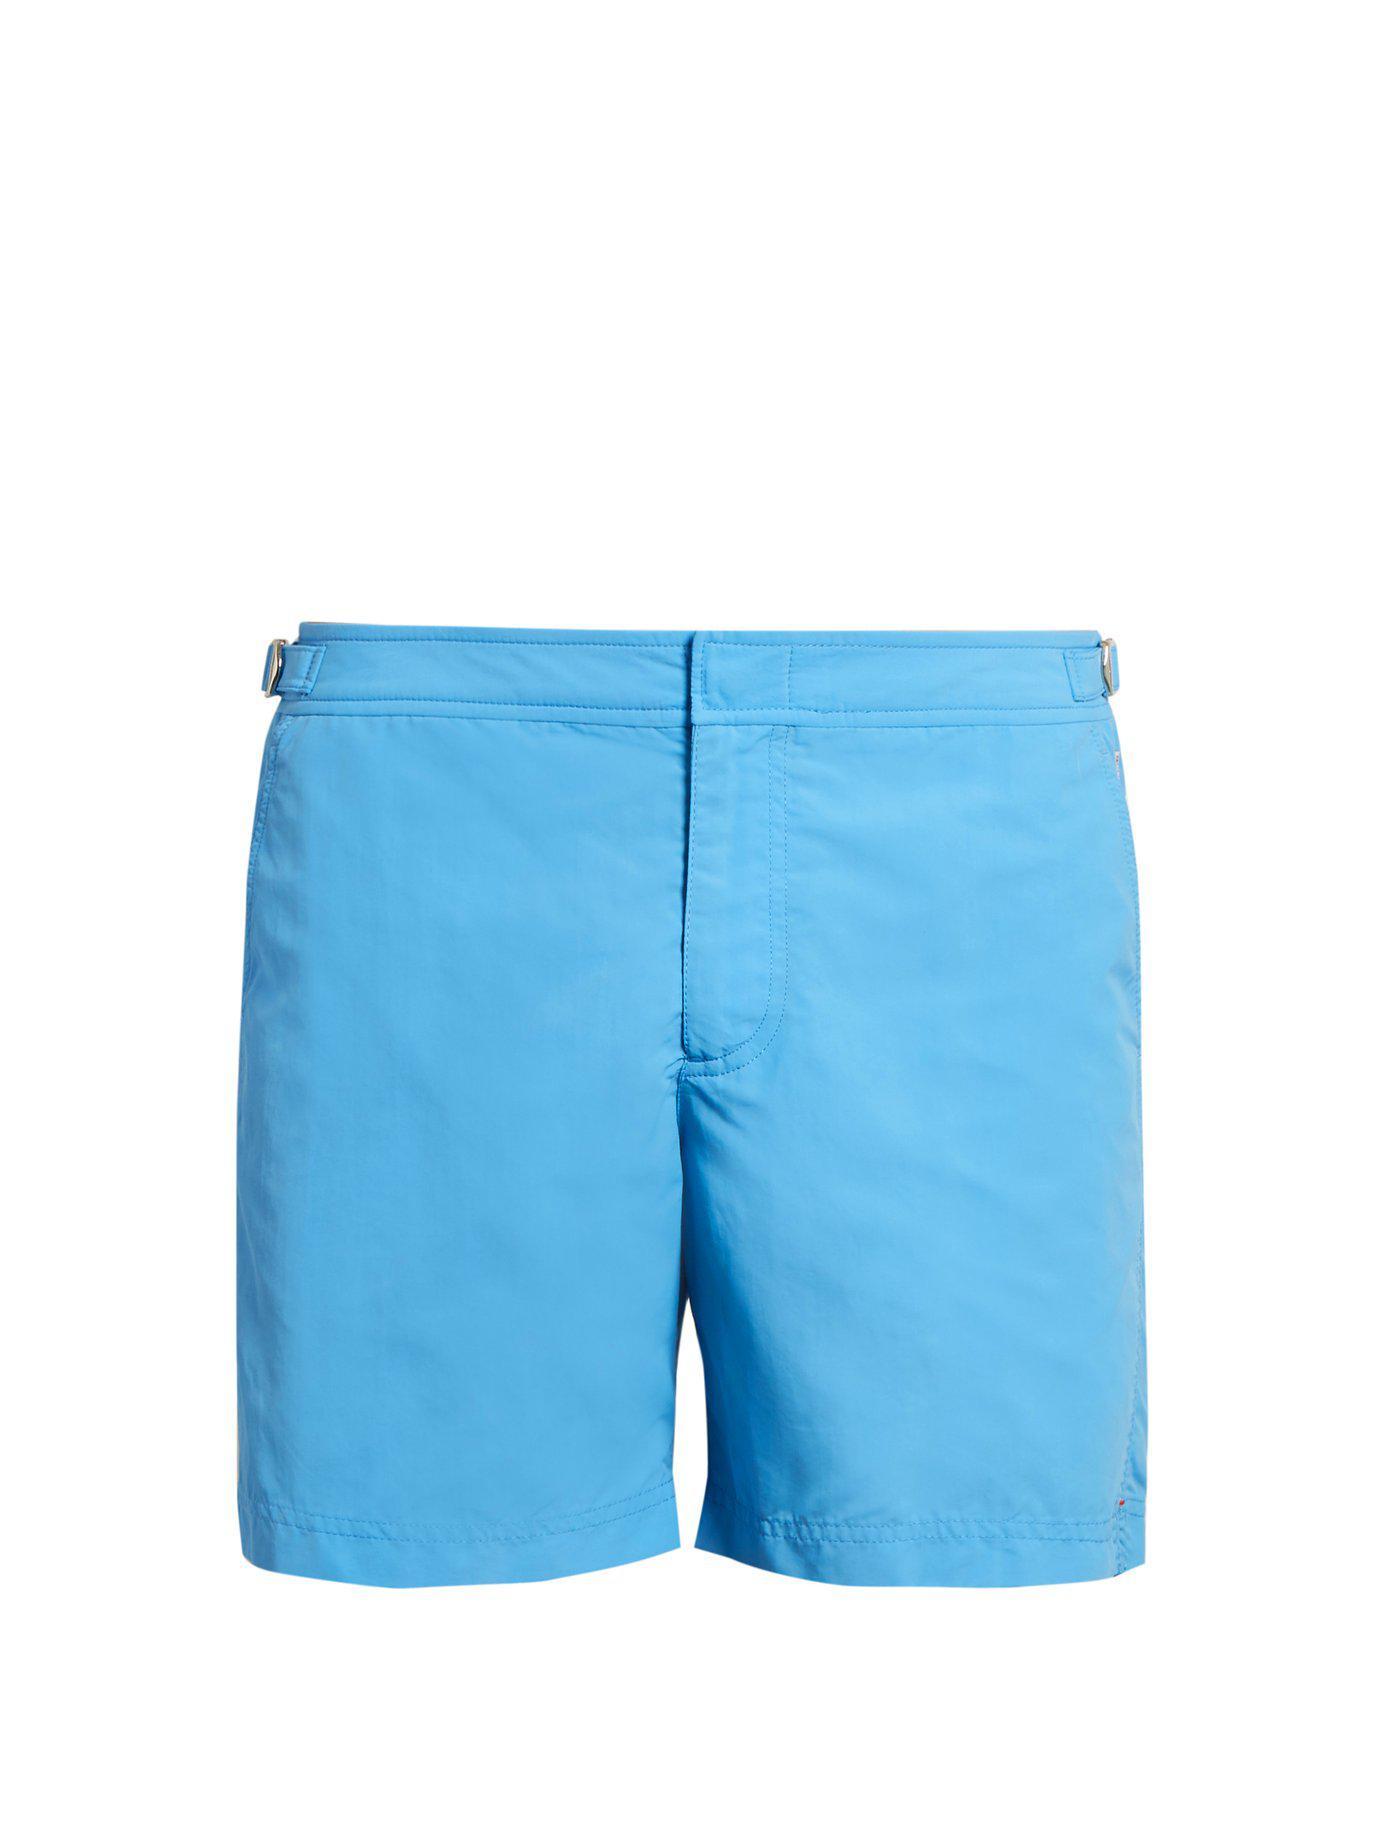 6e45fa834f9 Lyst - Orlebar Brown Bulldog Mid Length Swim Shorts in Blue for Men